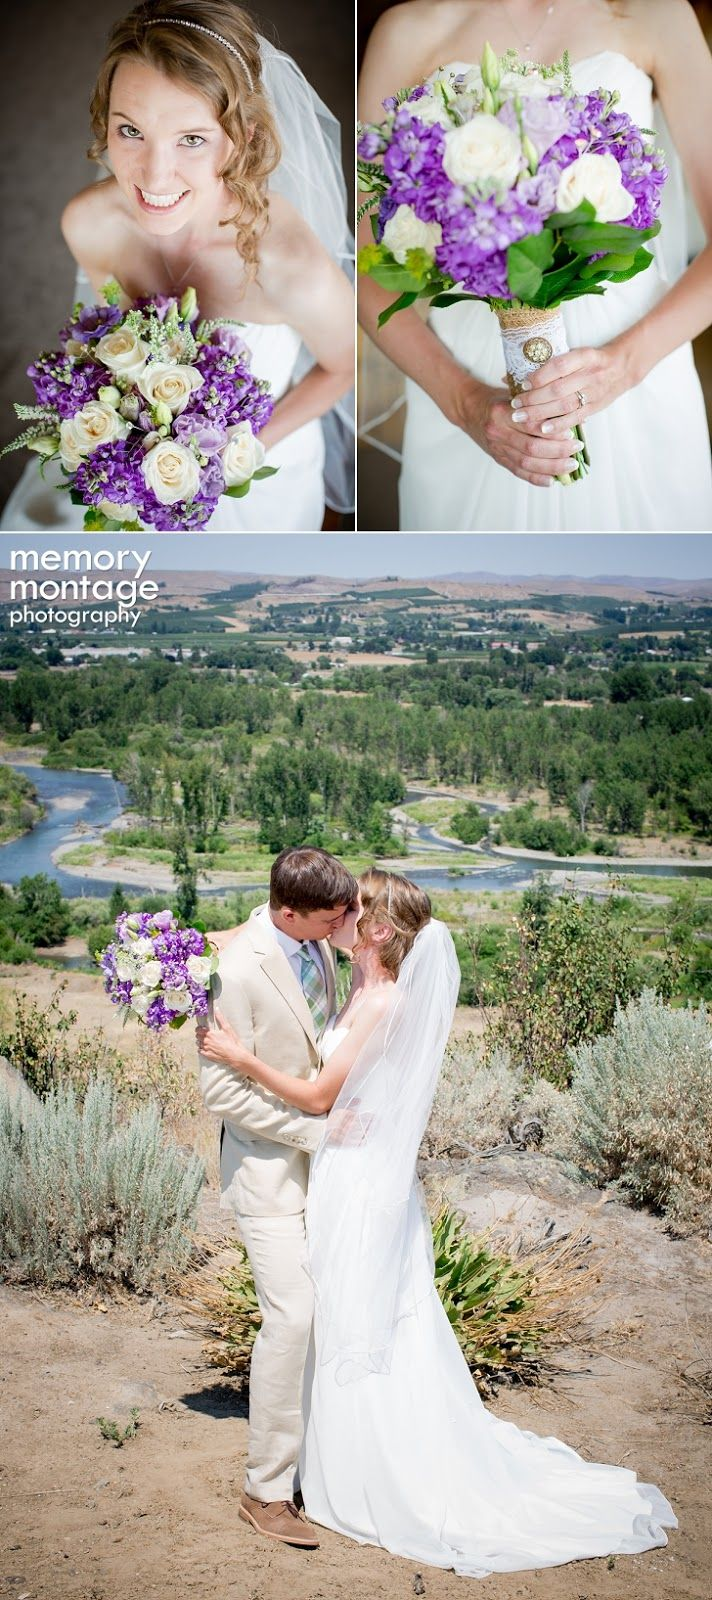 memory montage photography   BLOG June Wedding at the Yakima ...